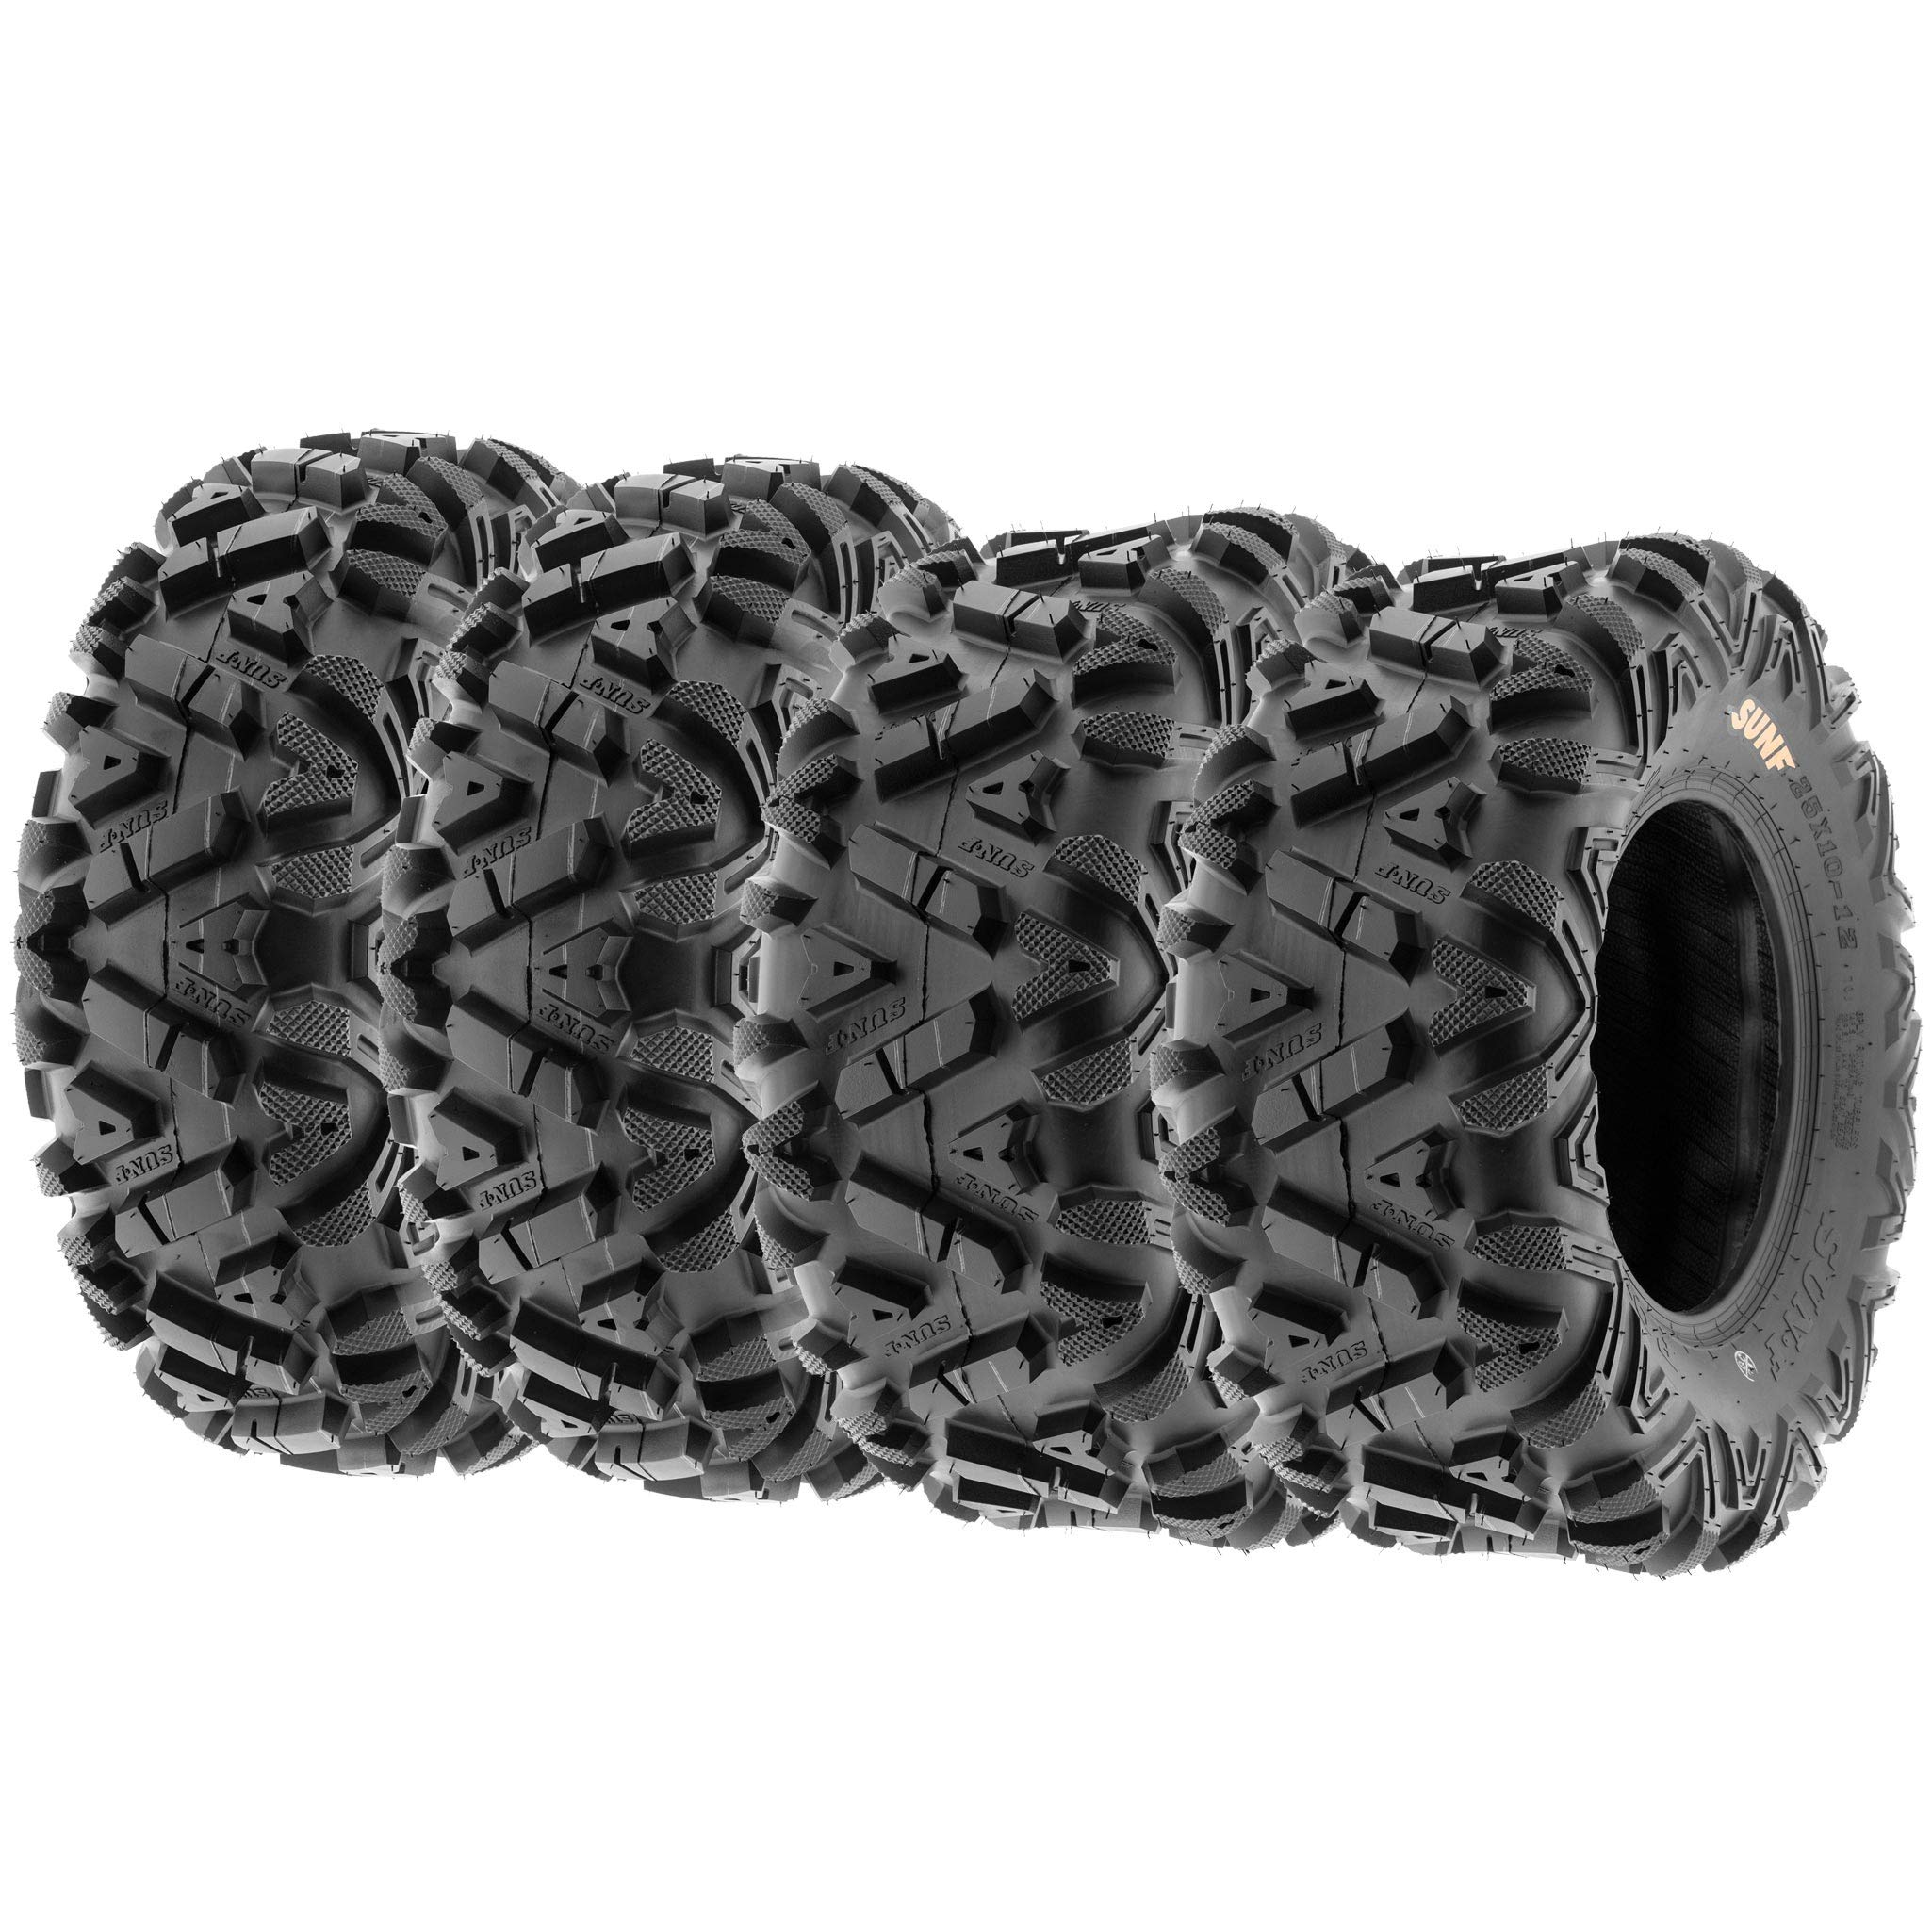 Set of 4 SunF Power.I ATV/UTV AT all-terrain Tires 24x8-11 Front & 24x11-10 Rear, 6 PR, Tubeless A033 by SUNF (Image #1)